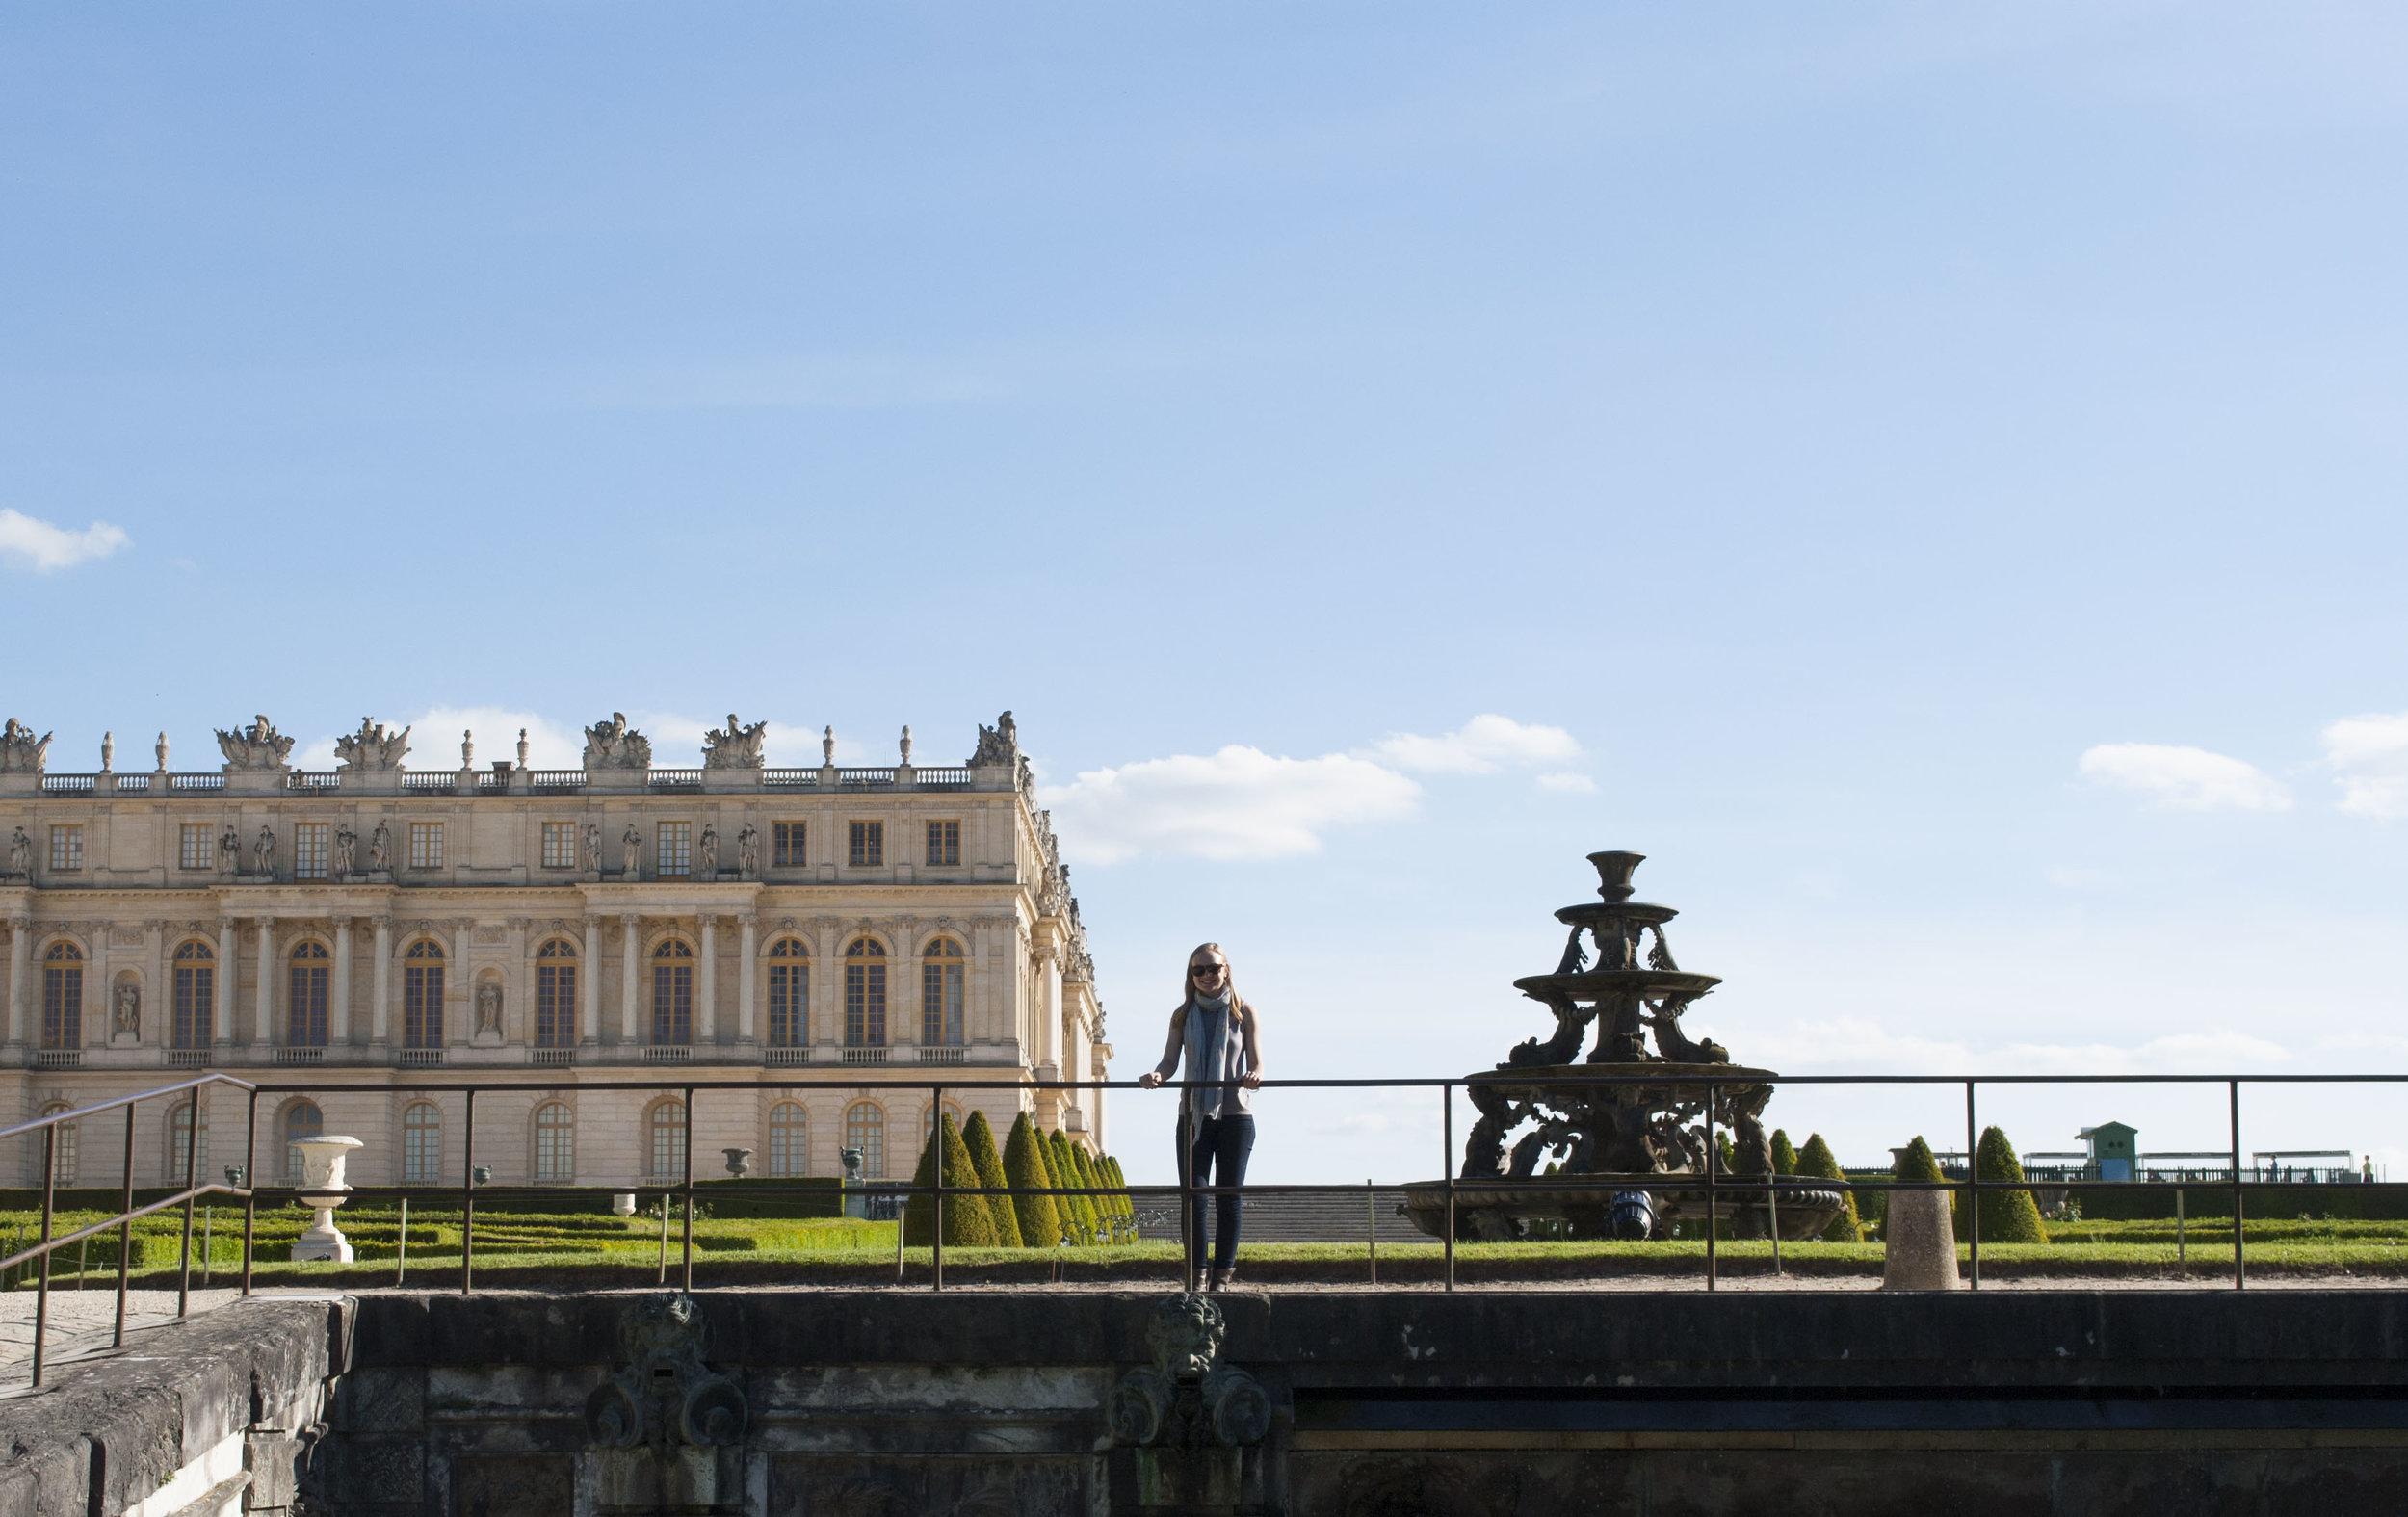 Exploring the Gardens of Versailles.